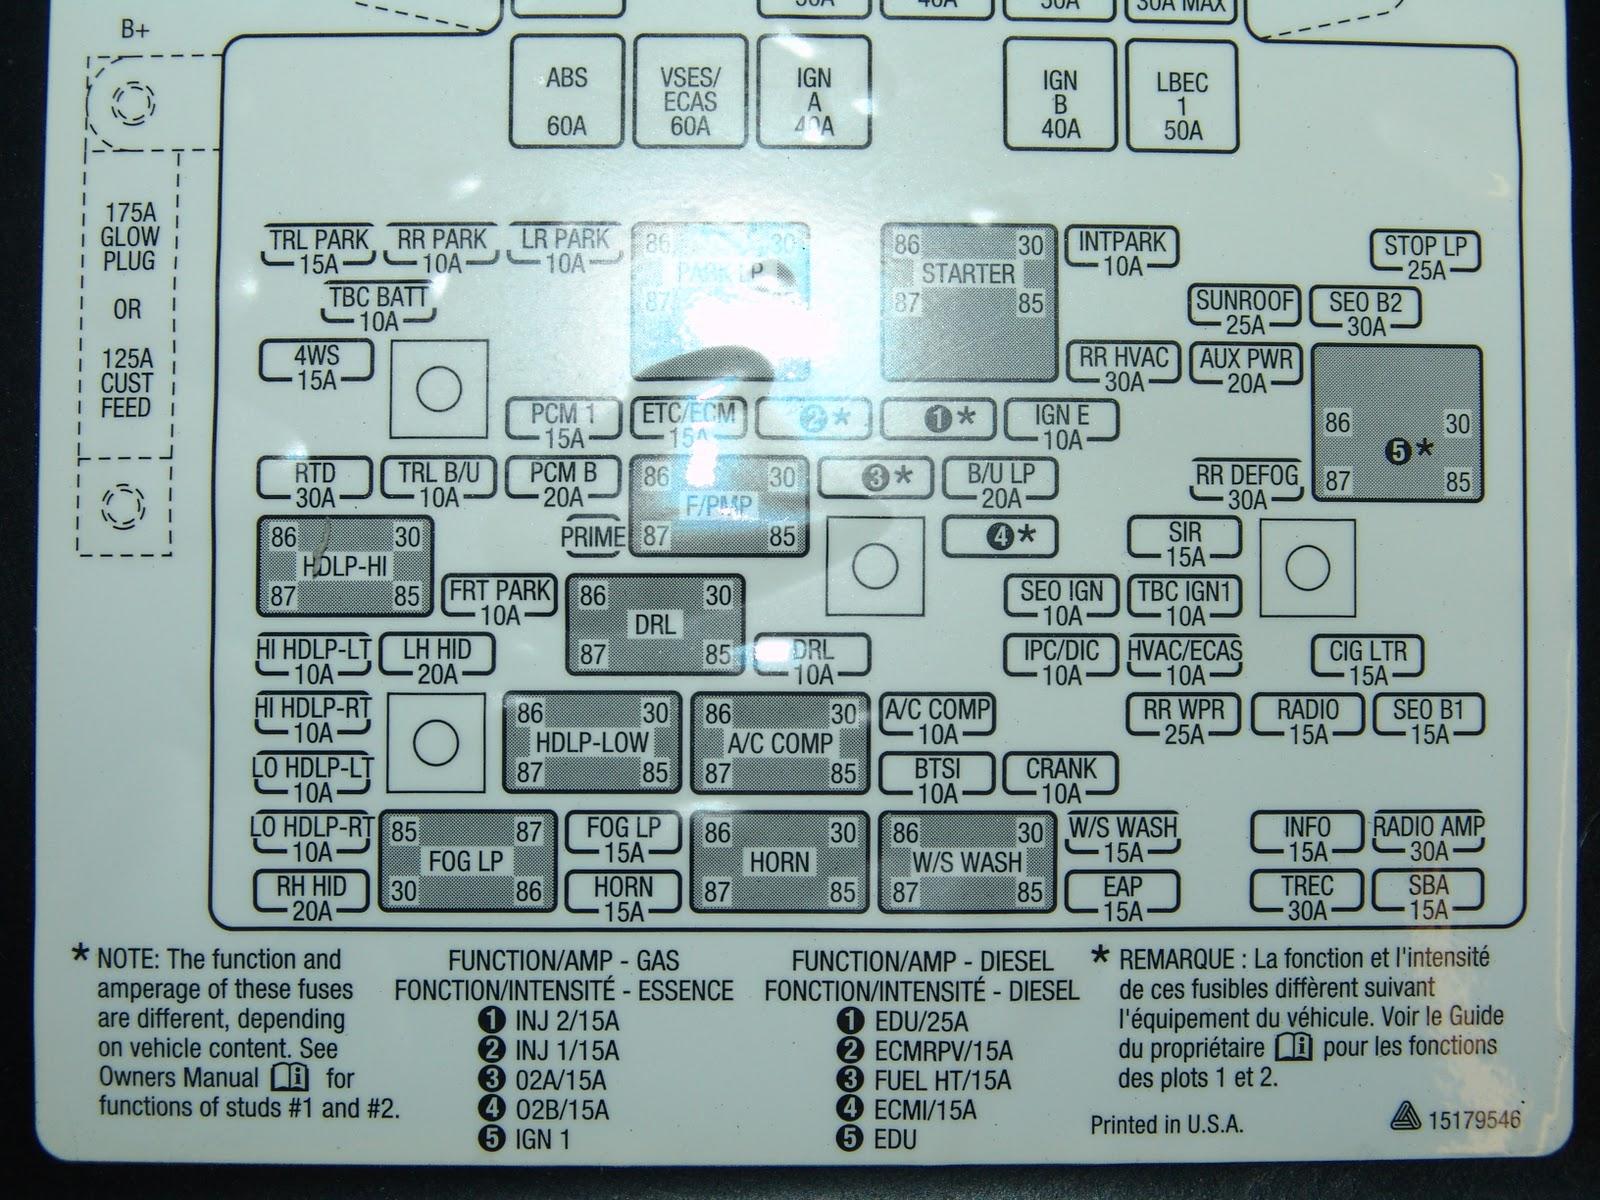 99 freightliner fl112 fuse box diagram free download wiring on 2000 Freightliner Fuse Box Diagram 2007 Freightliner Columbia Wiring Diagrams for freightliner fuse panel diagram new wiring diagram 2018 for freightliner fl112 headlamp wiring diagram freightliner fl112